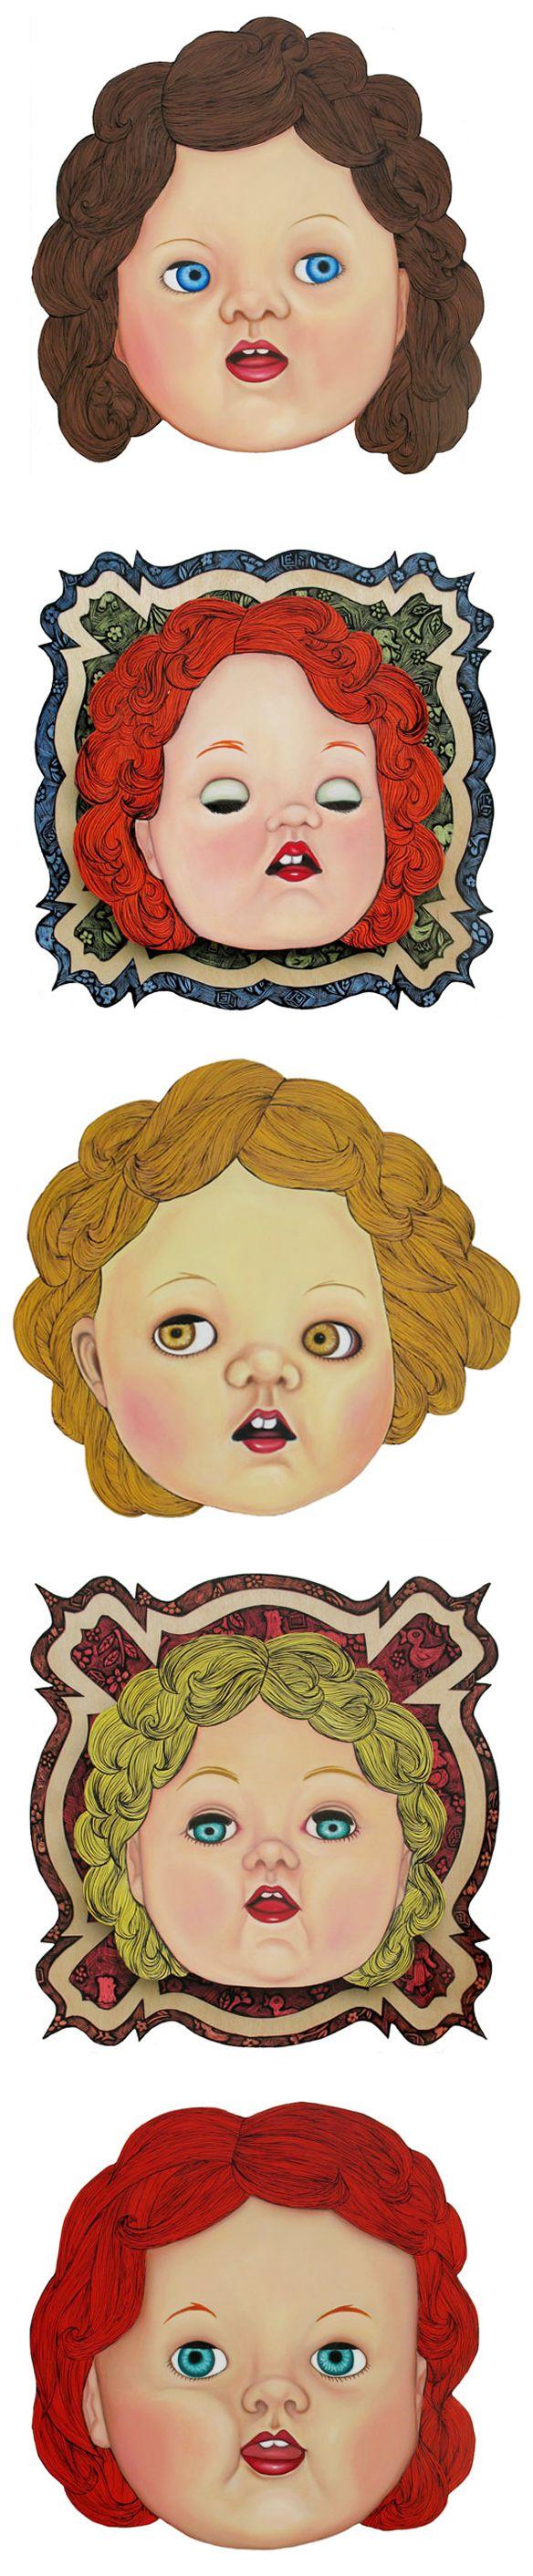 andrea hooge - doll head paintings on cut wood? <3 !!!